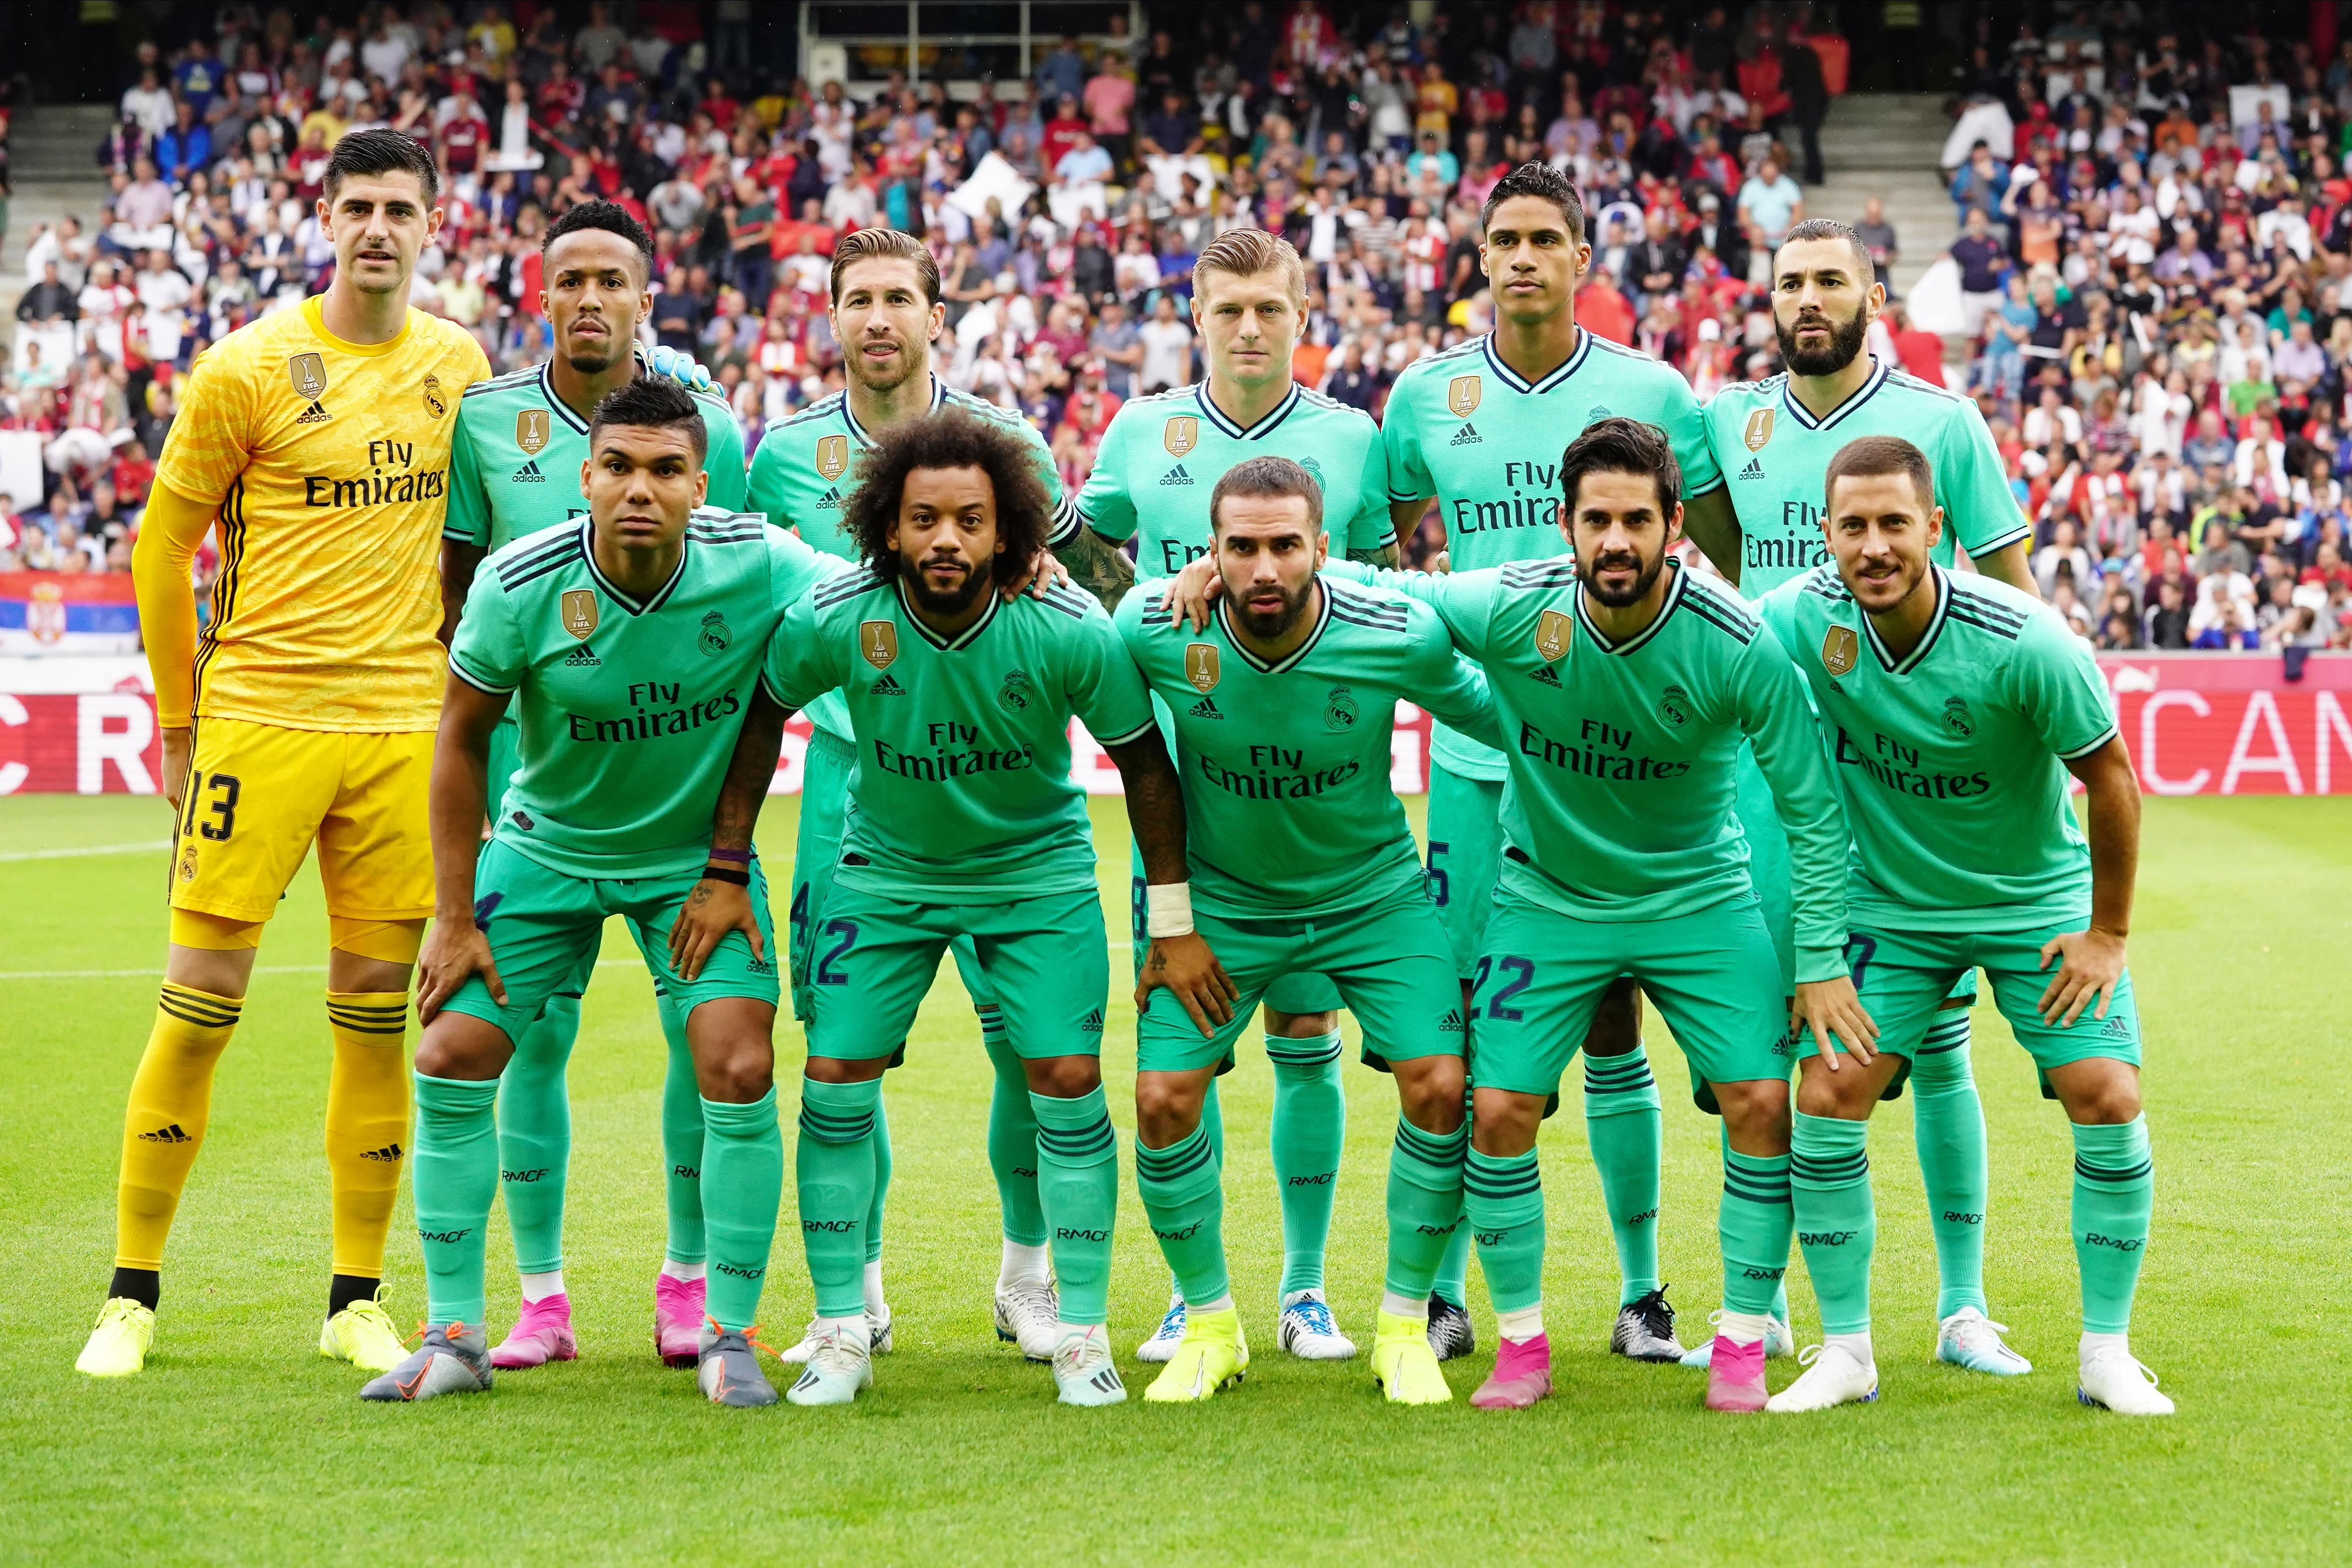 RB Salzburg v Real Madrid - Pre-Season Friendly